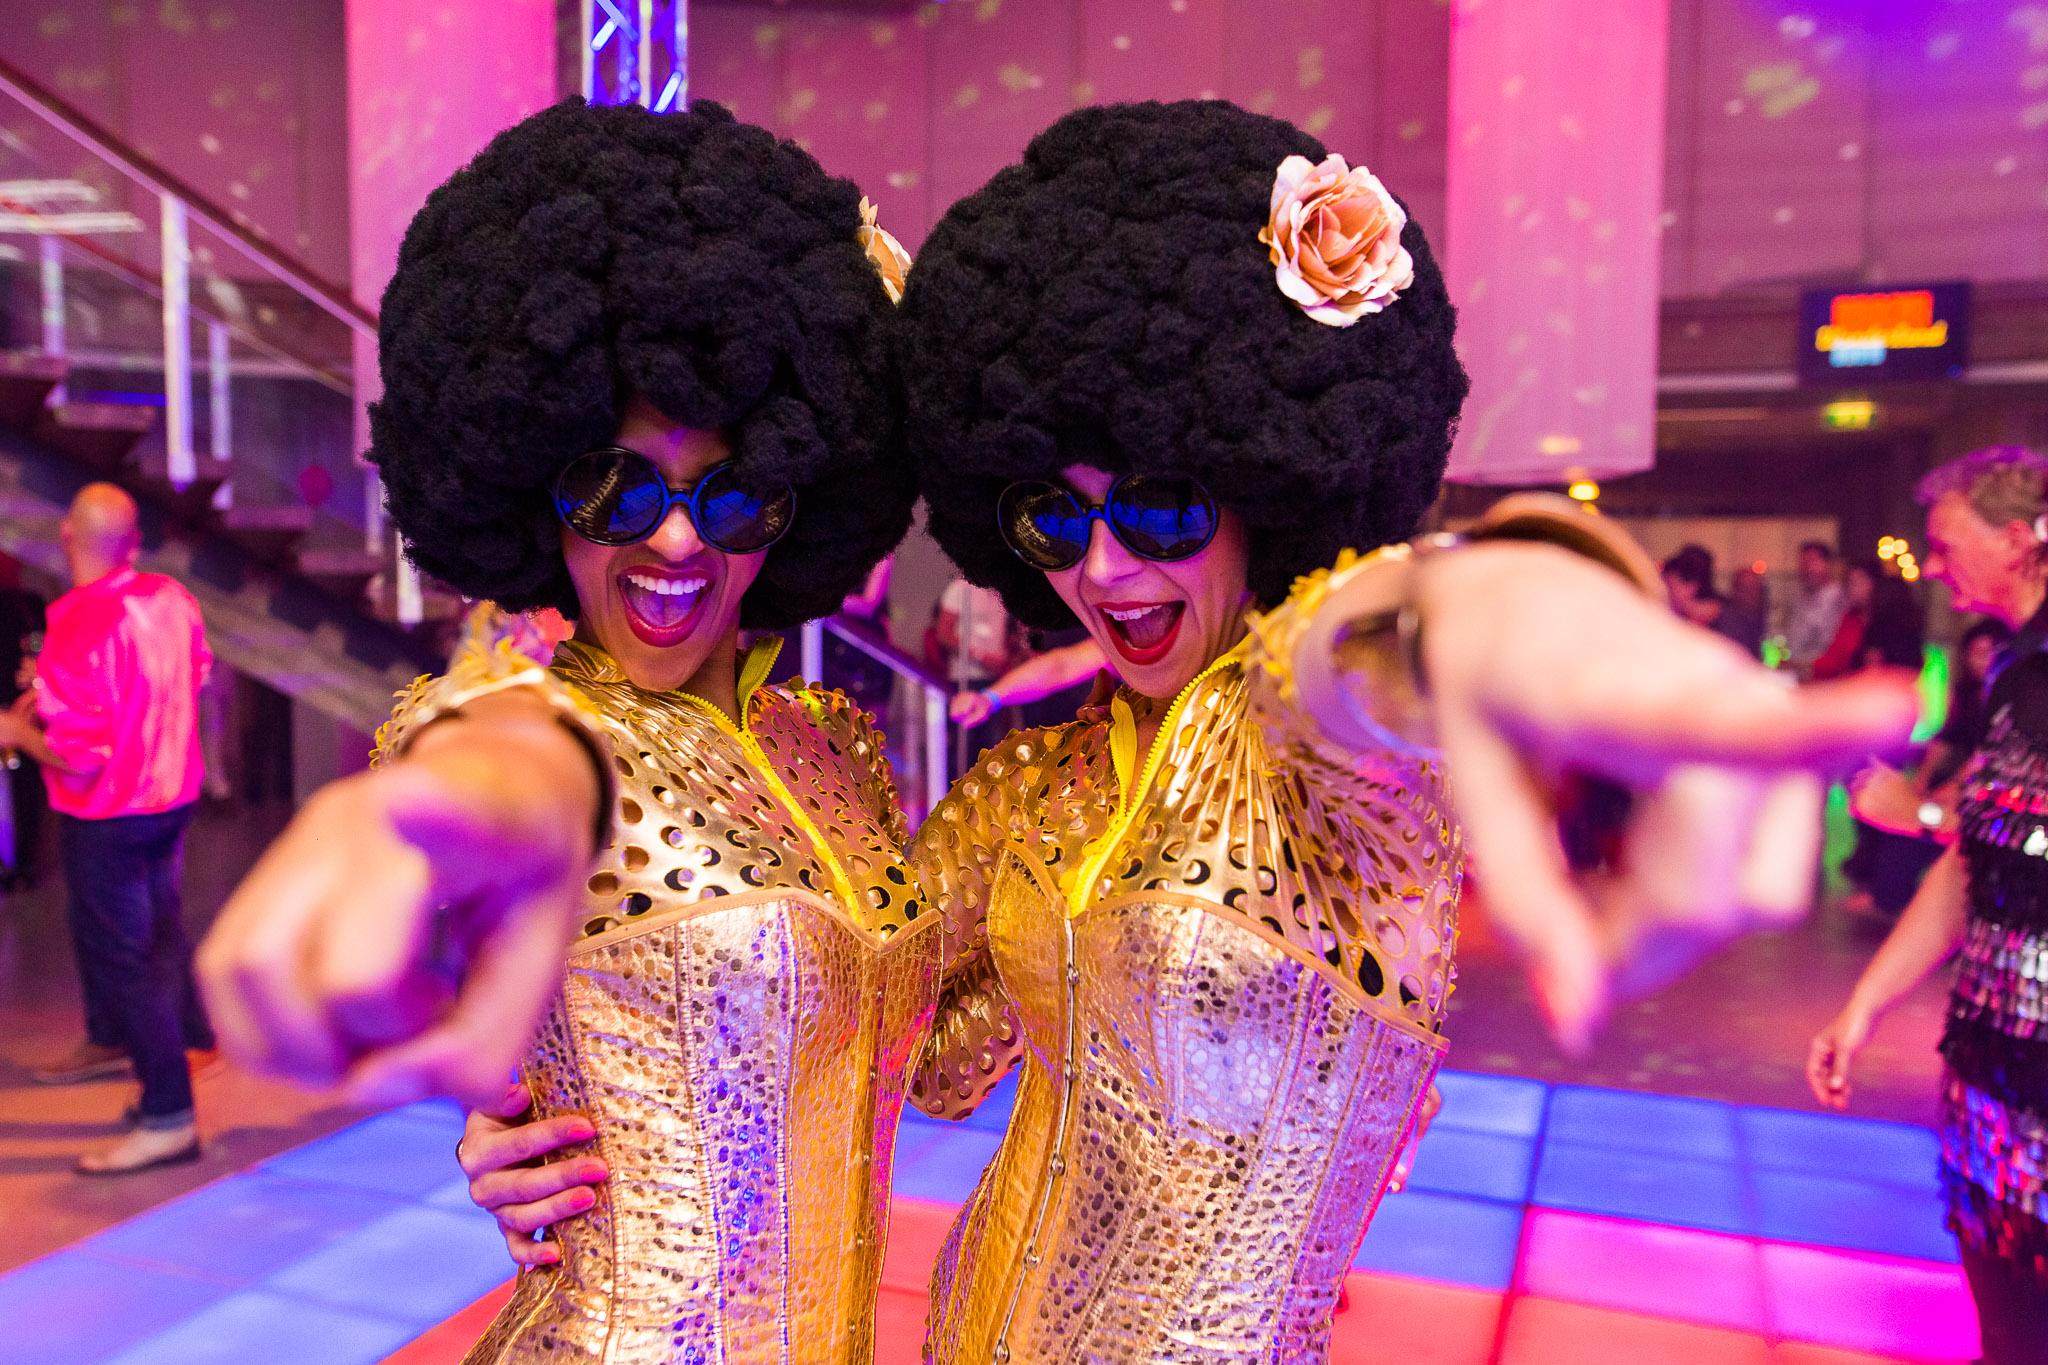 Boogie Wonderland Show danseressen in kostuum wijzend